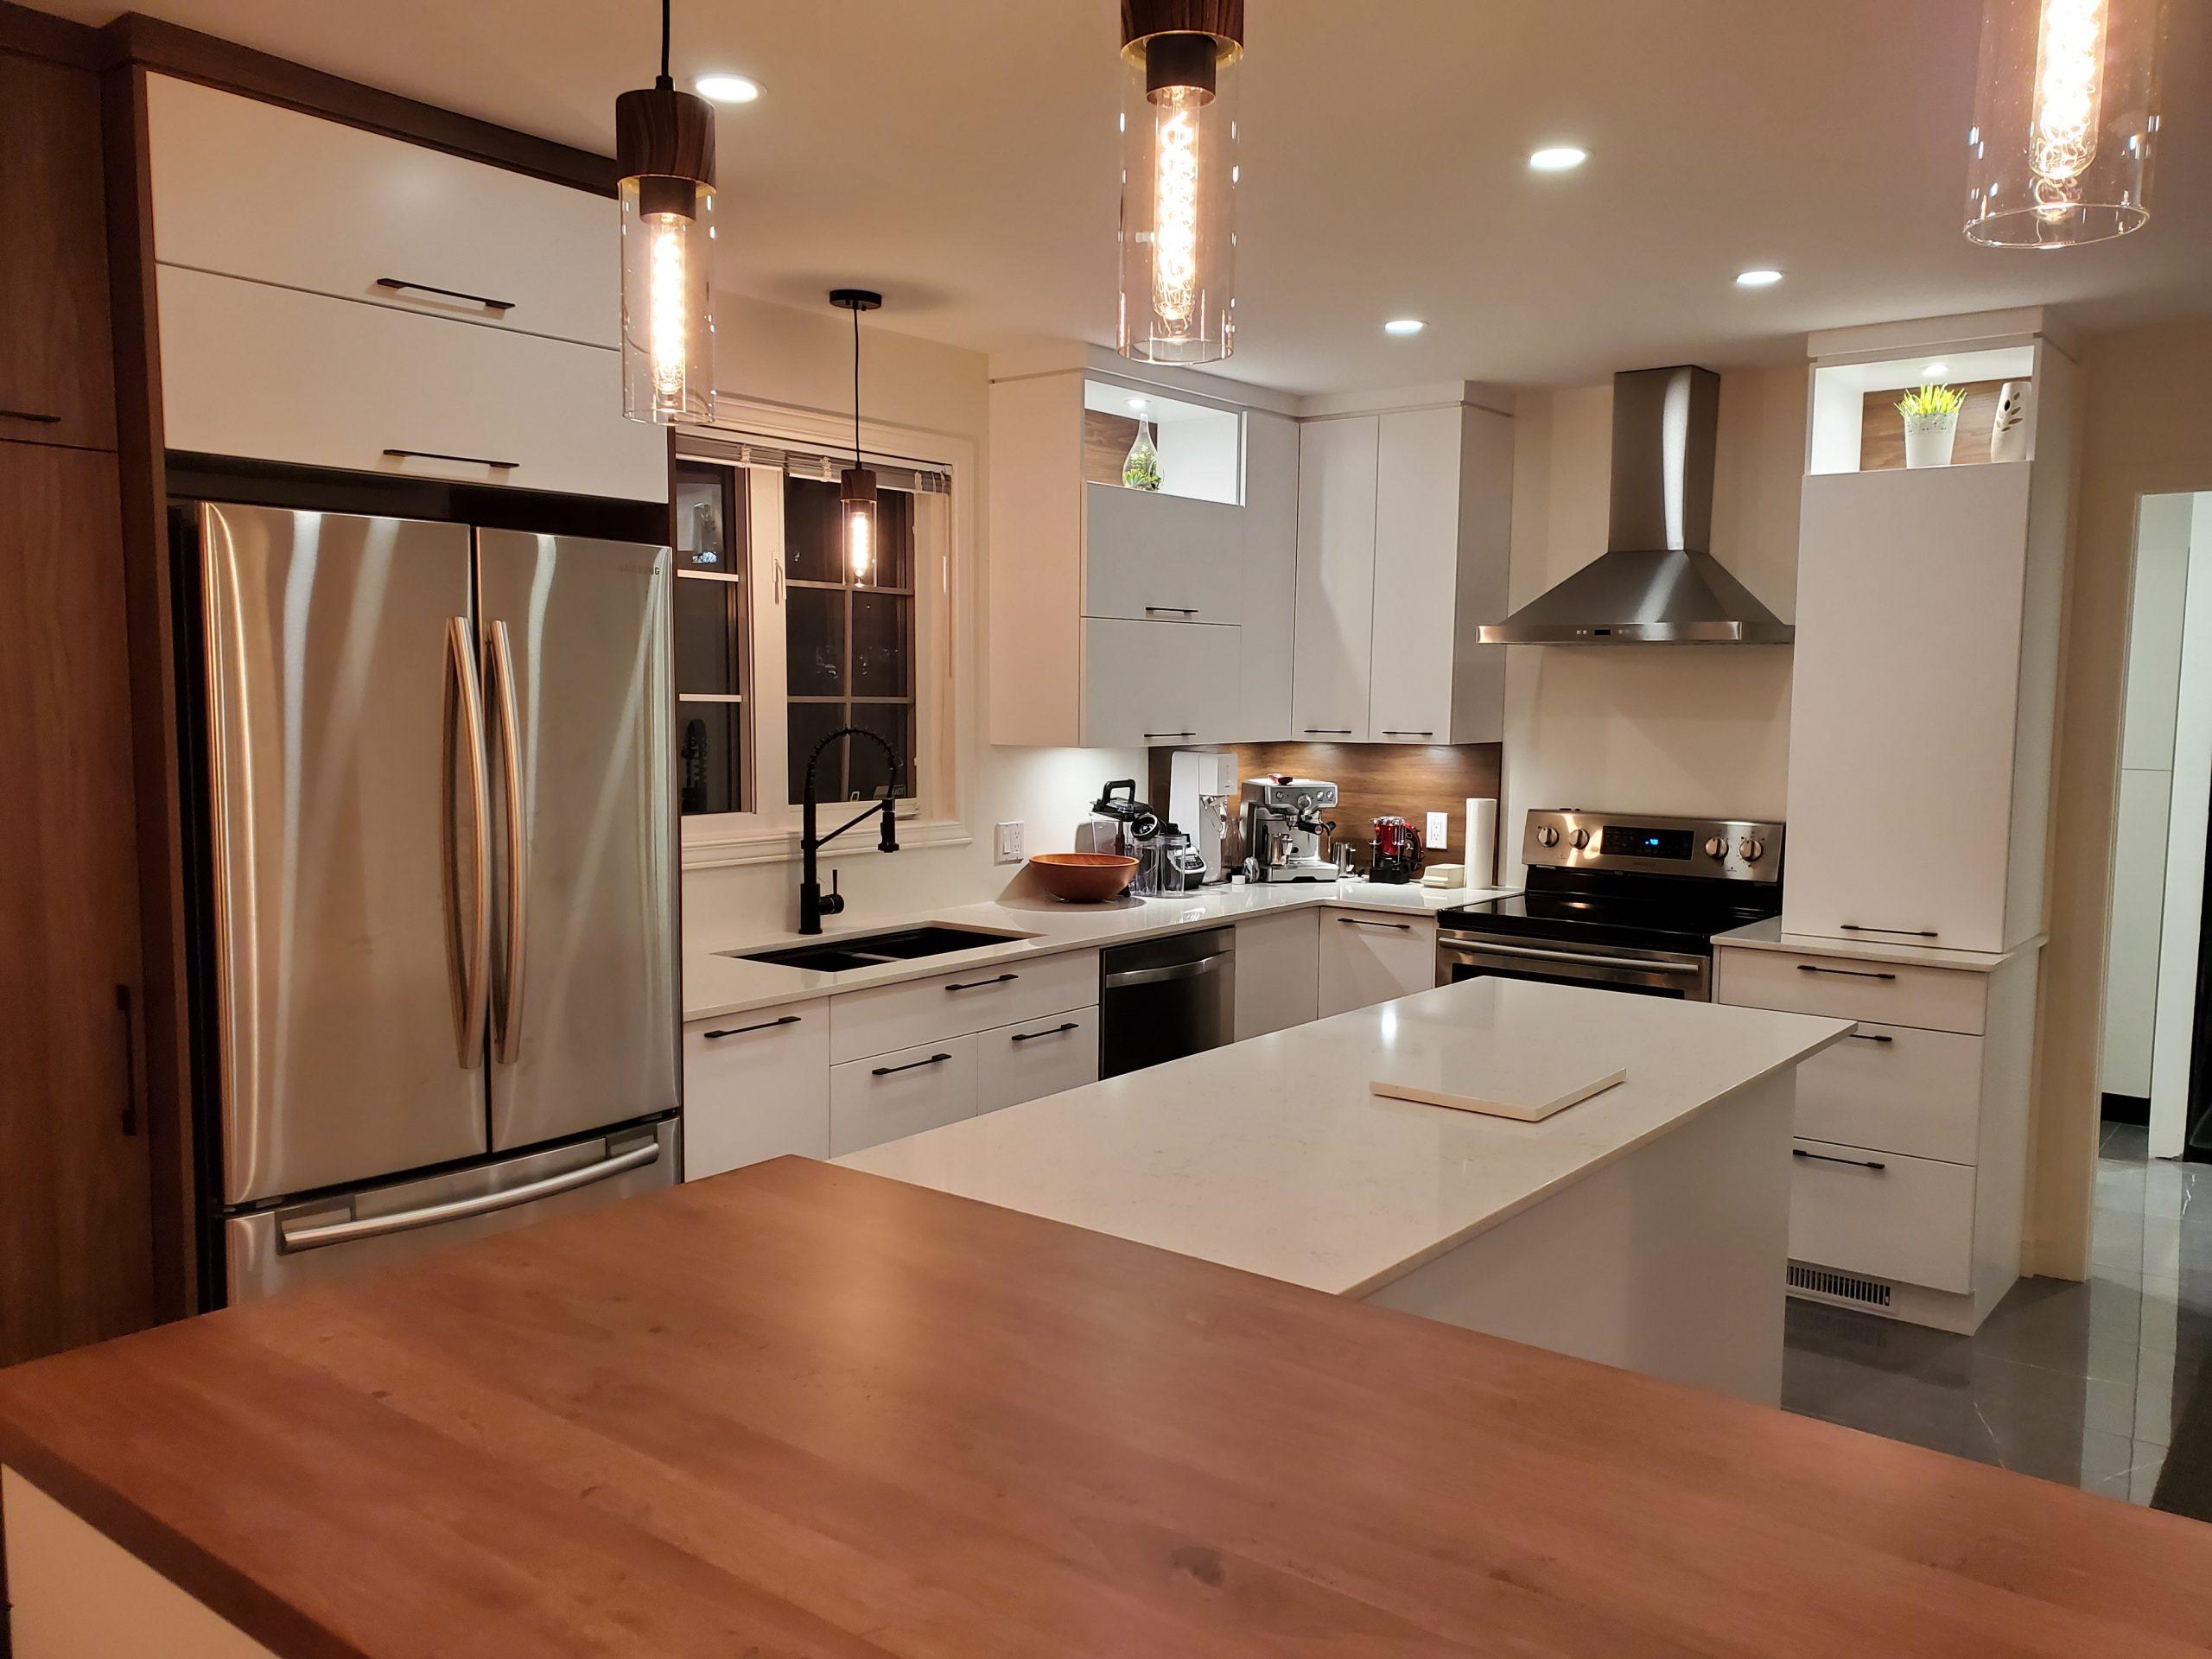 Comment Installer Un Comptoir De Cuisine granit signature, comptoir de granit, comptoir de quartz